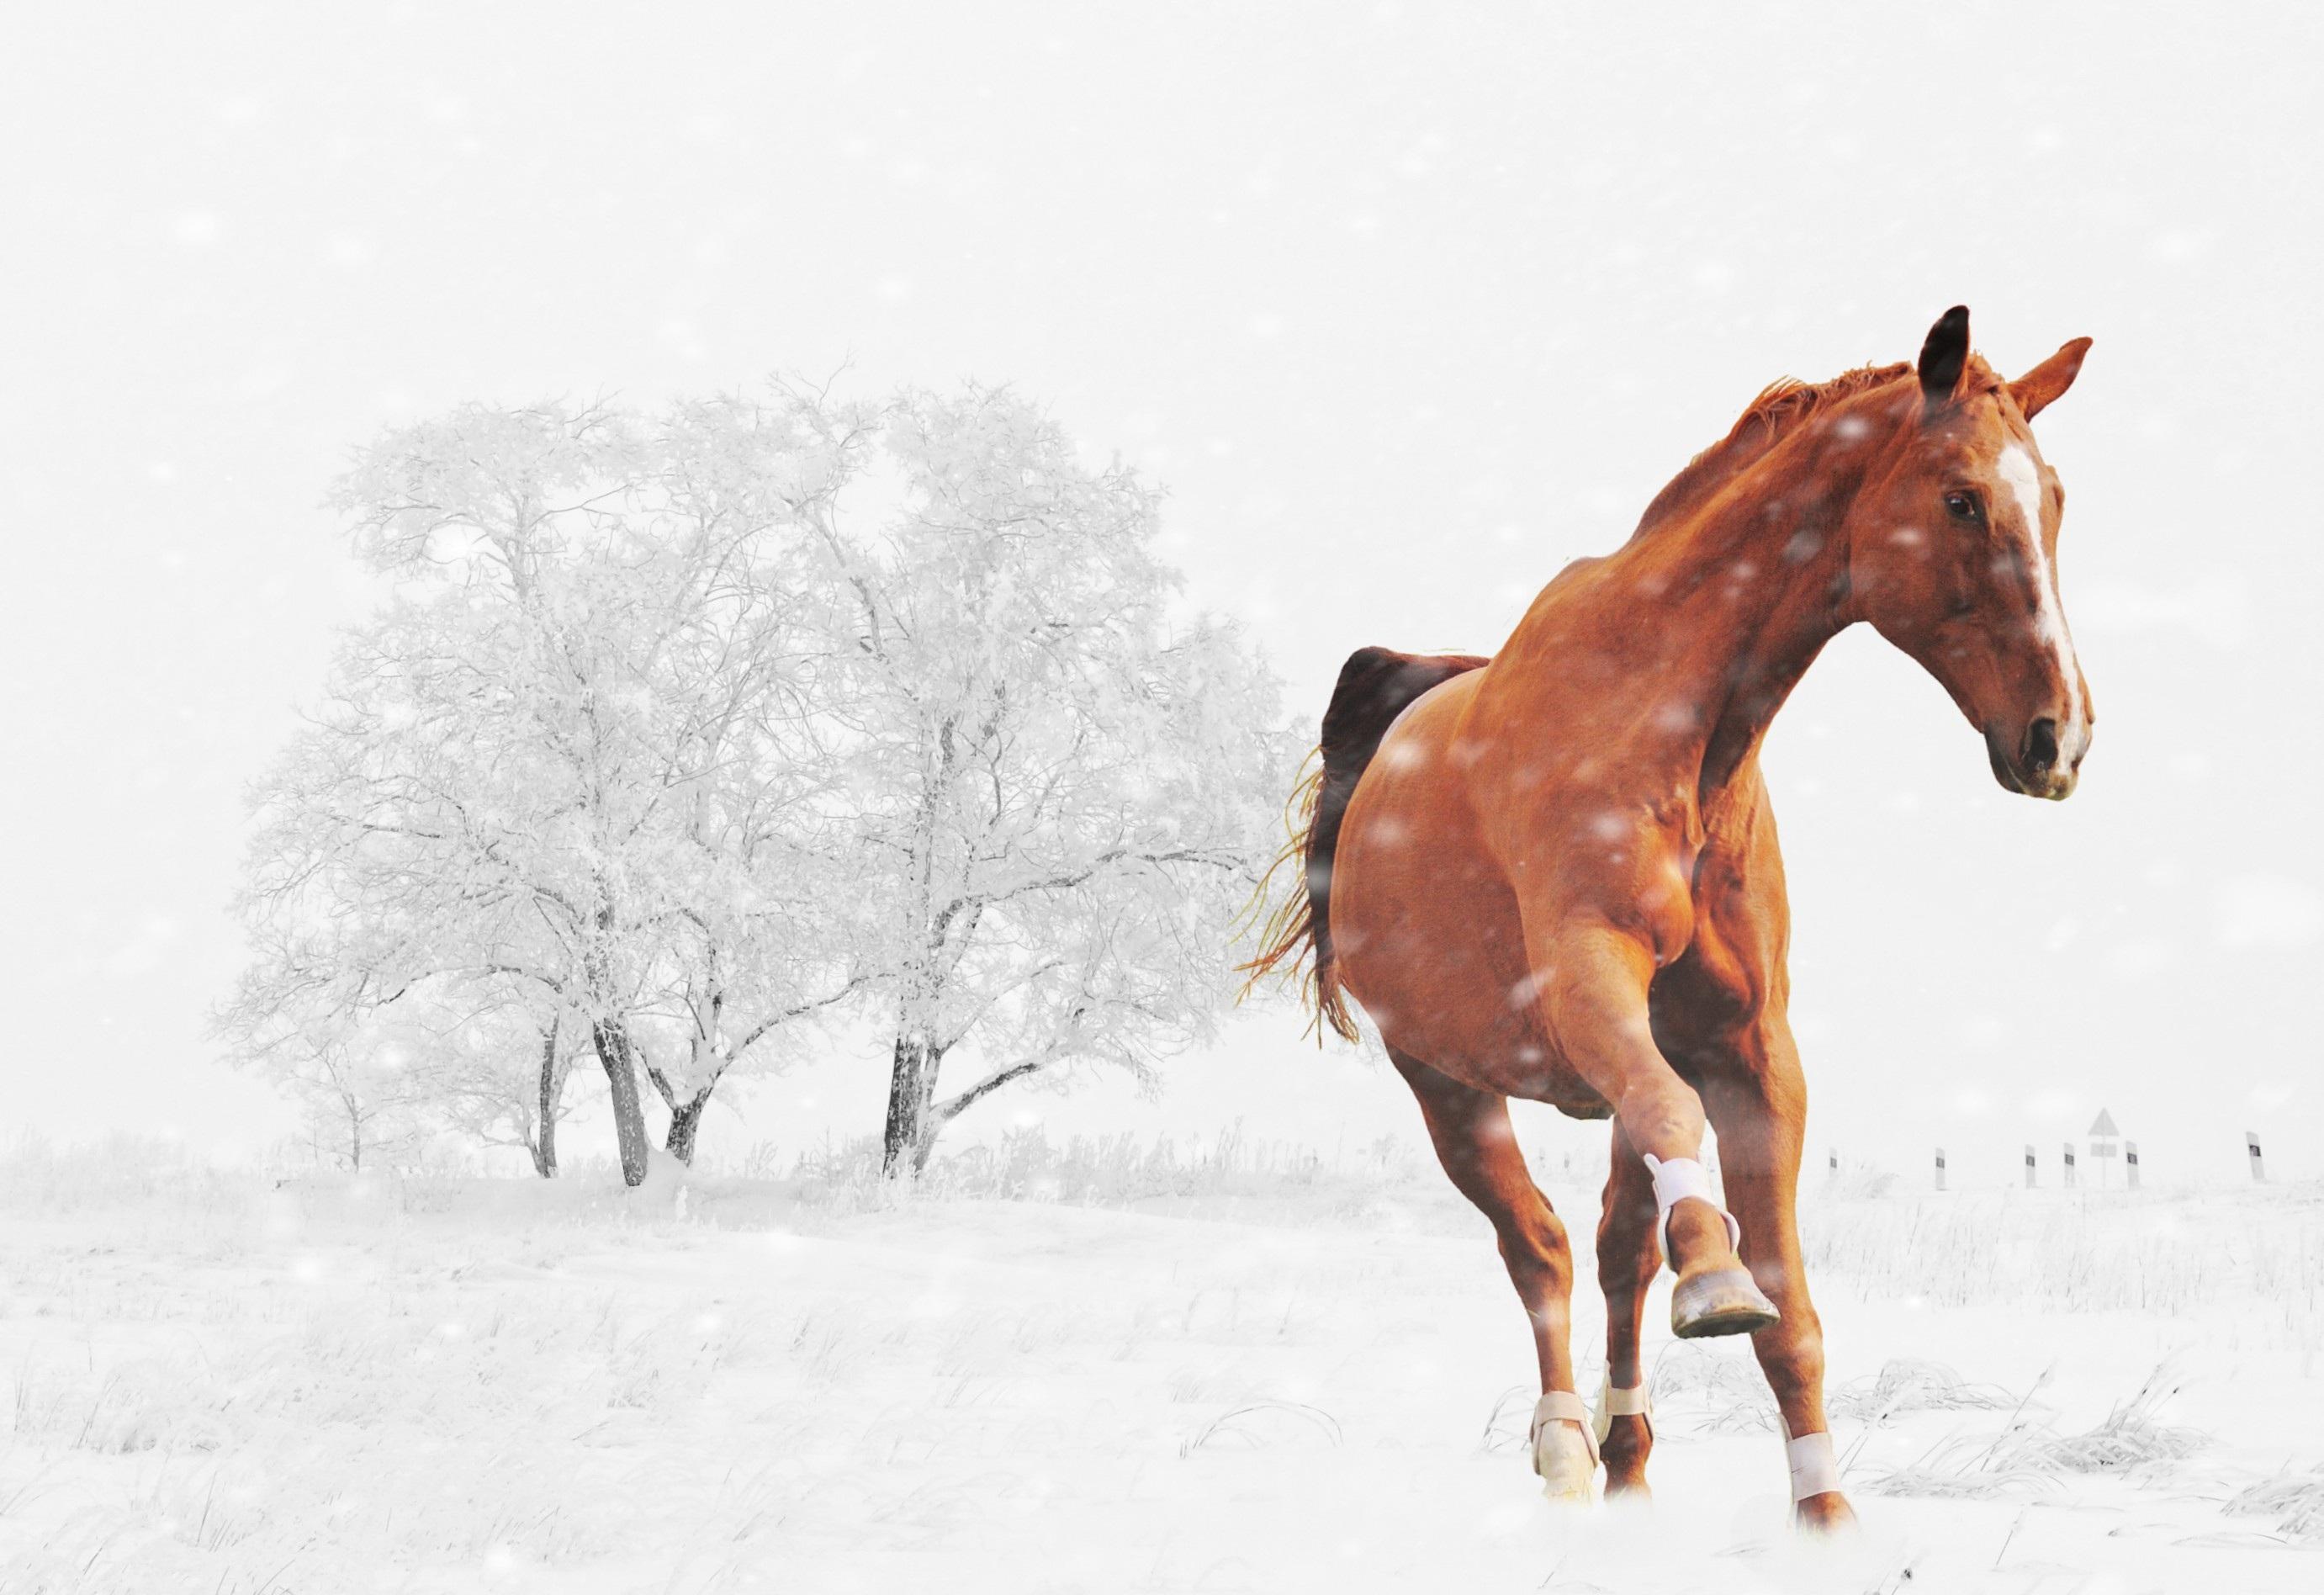 93+ Gambar Hewan Kuda Gratis